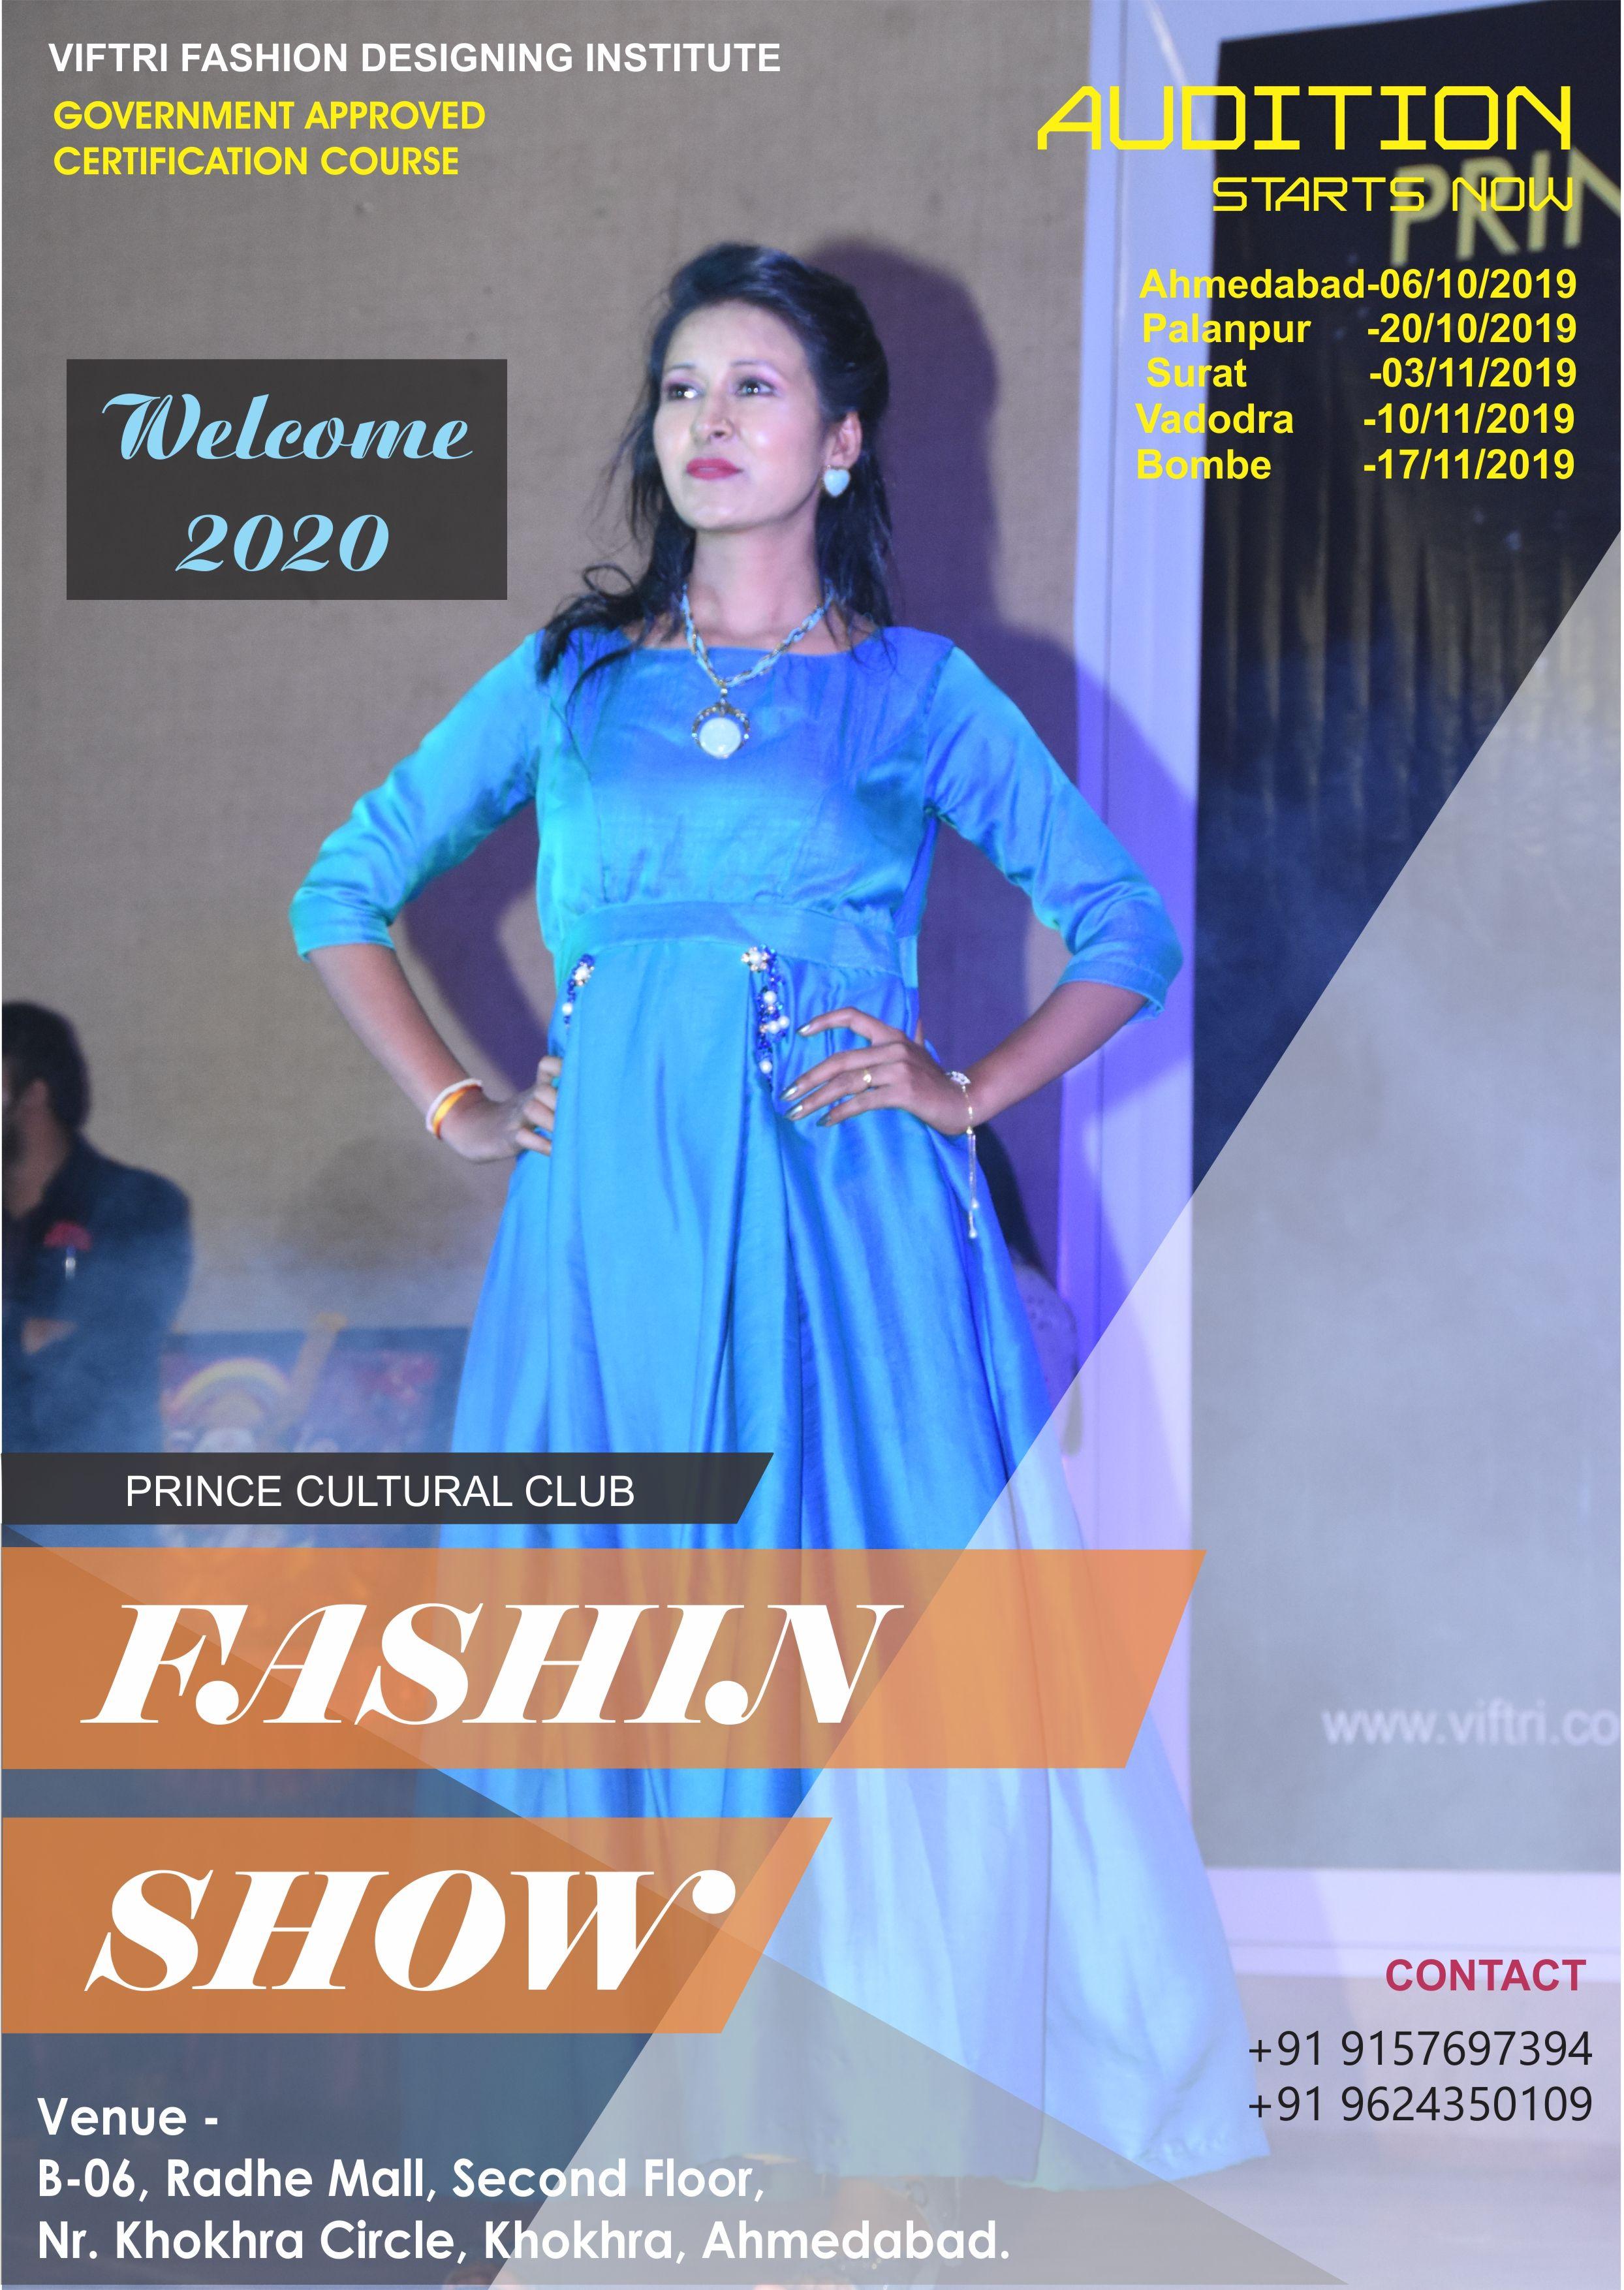 Prince Cultural Club Viftri Fashion Designing Institute Present S Fashion Show 2019 Multi Talent Show Fashion Designing Institute Fashion Design Fashion